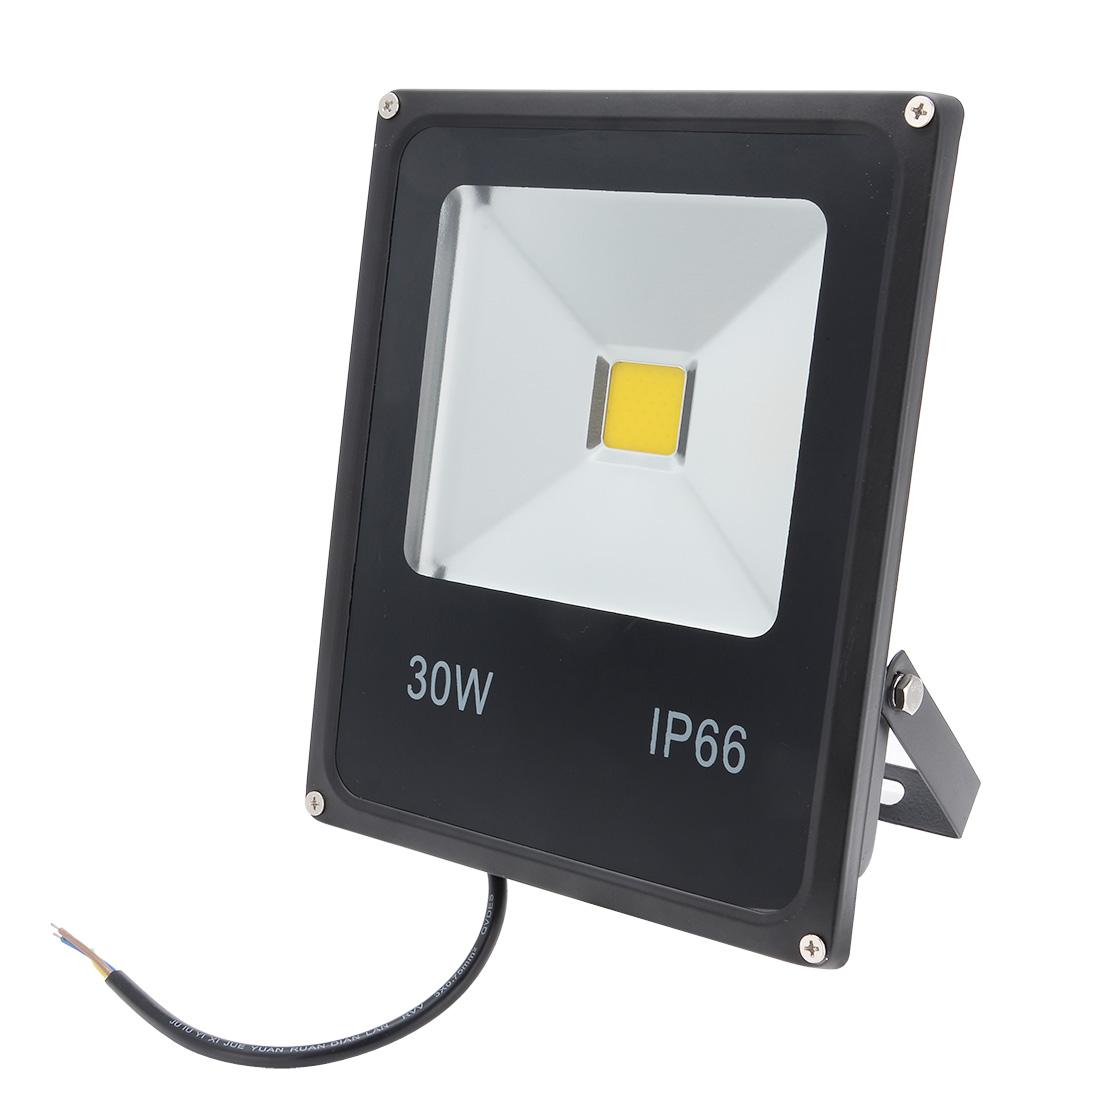 30W LED Flood Light Lamp Outdoor Spot Lamp 85-265V Waterproof Pure White IP65